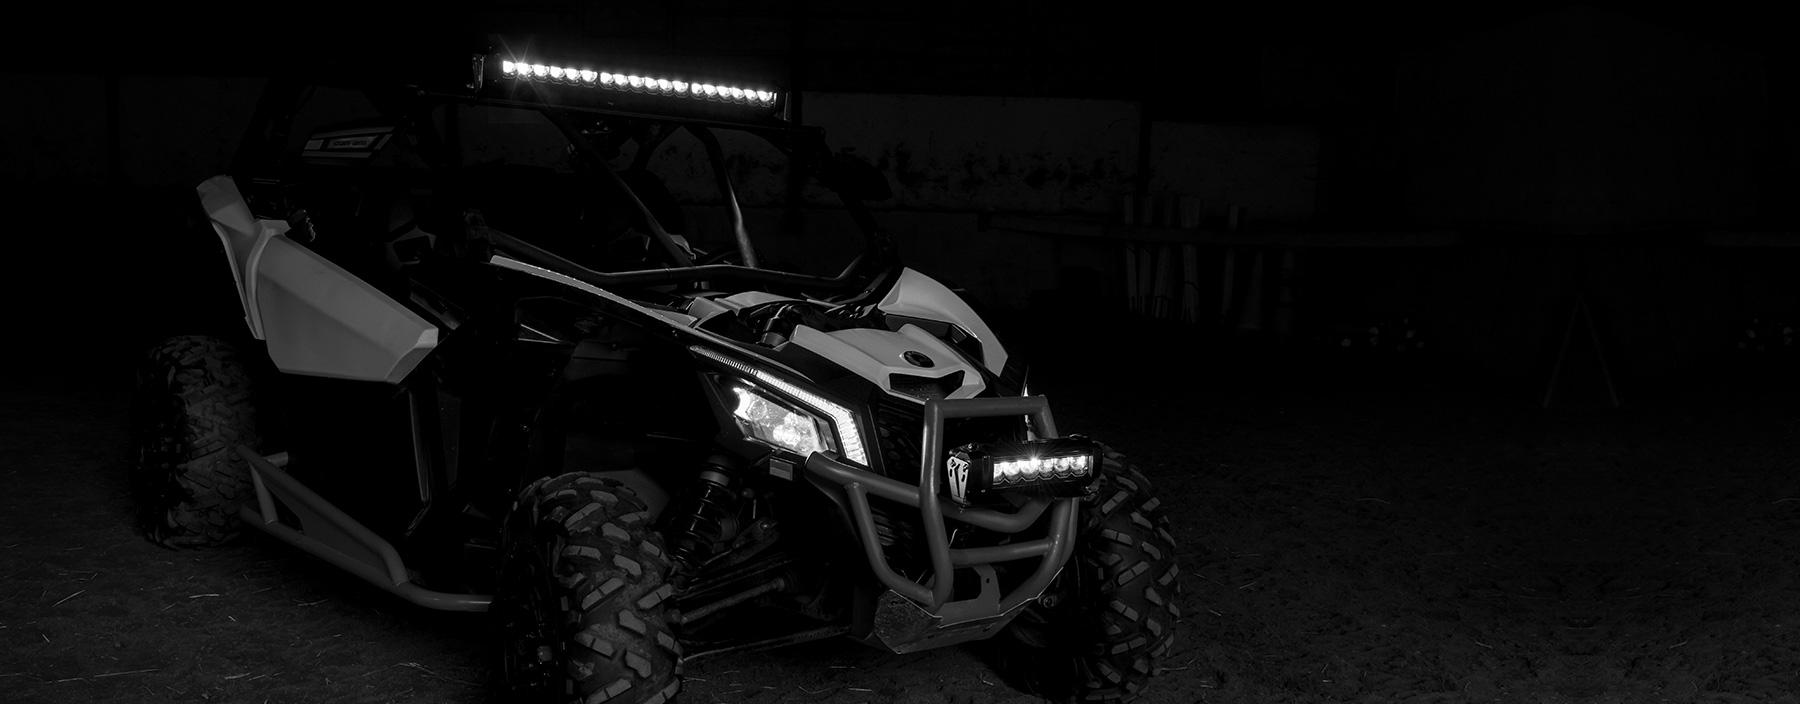 ASIO Evo Smart LED Light bar - Precision lighting for vehicle